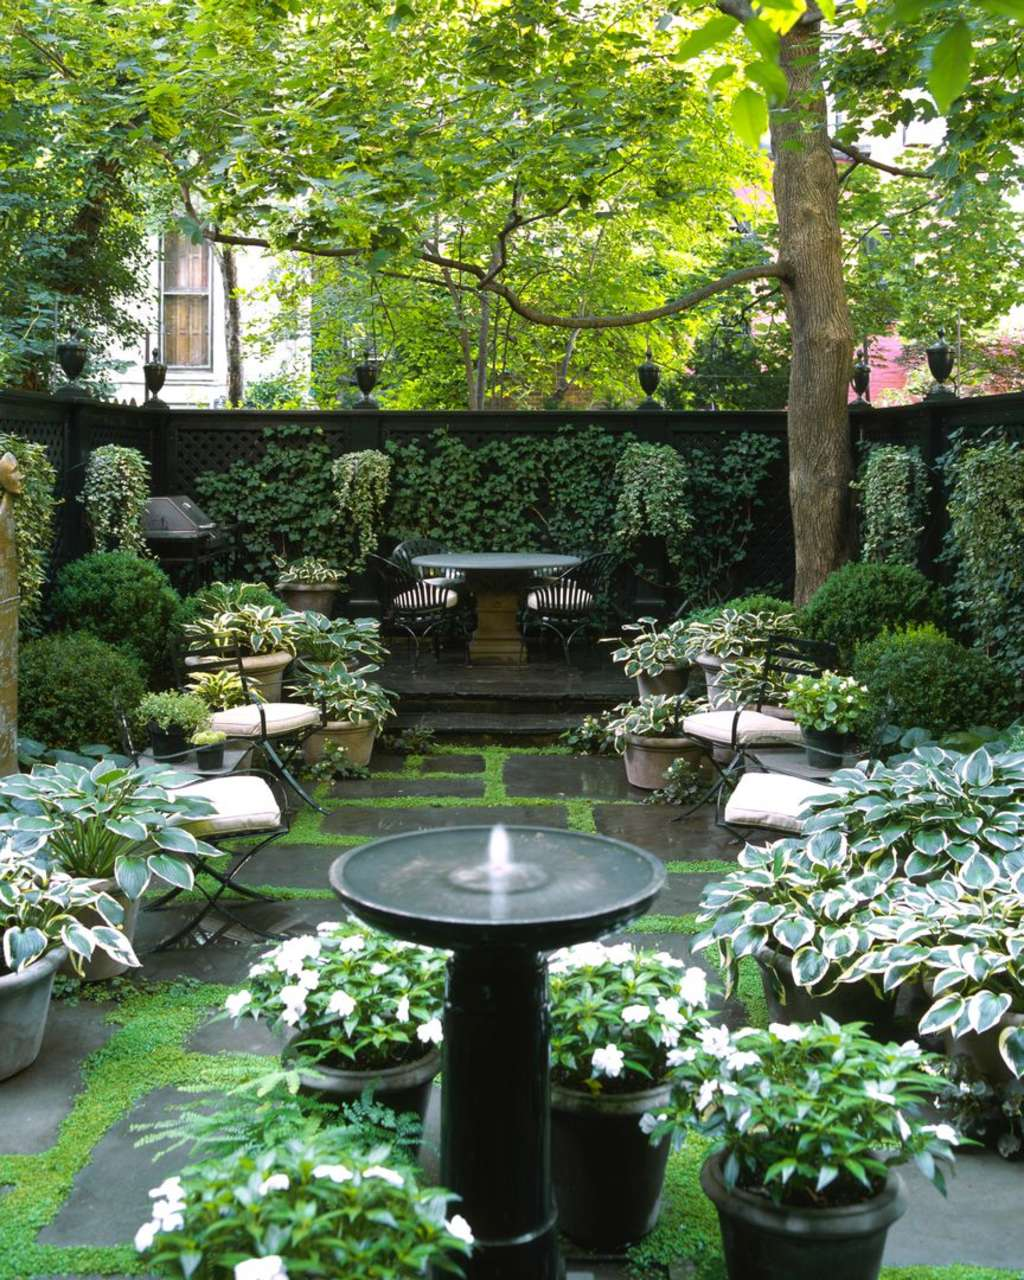 12 Dreamy Backyards In The City